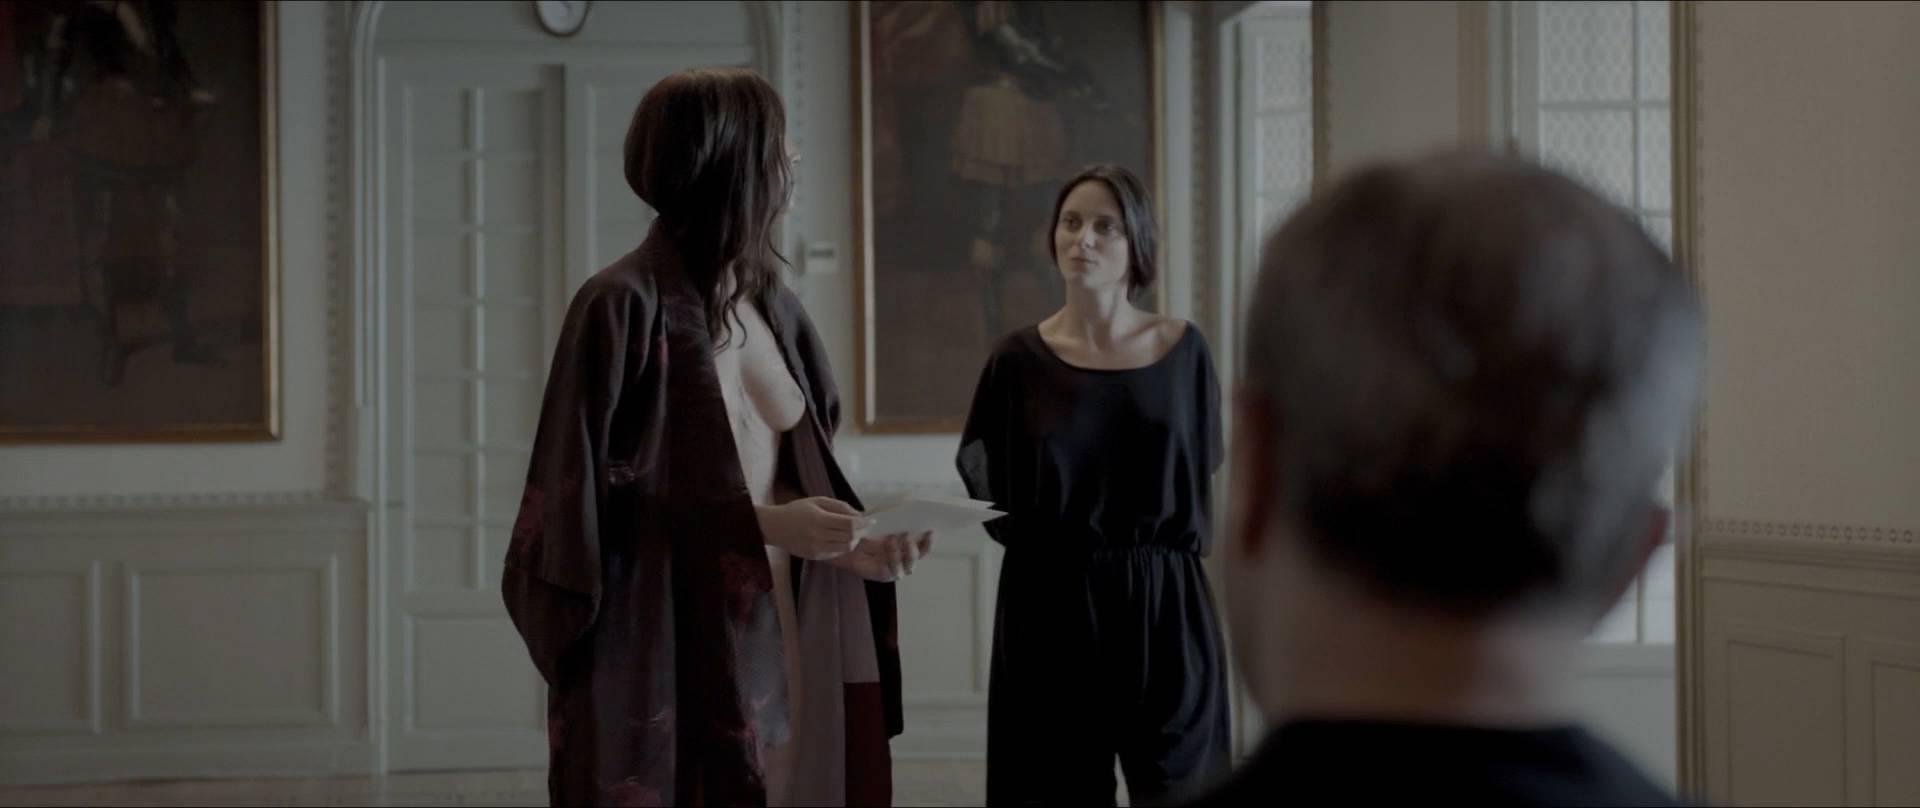 Bárbara Lennie nude full frontal - Magical Girl (ES-2014) hd080p (1)